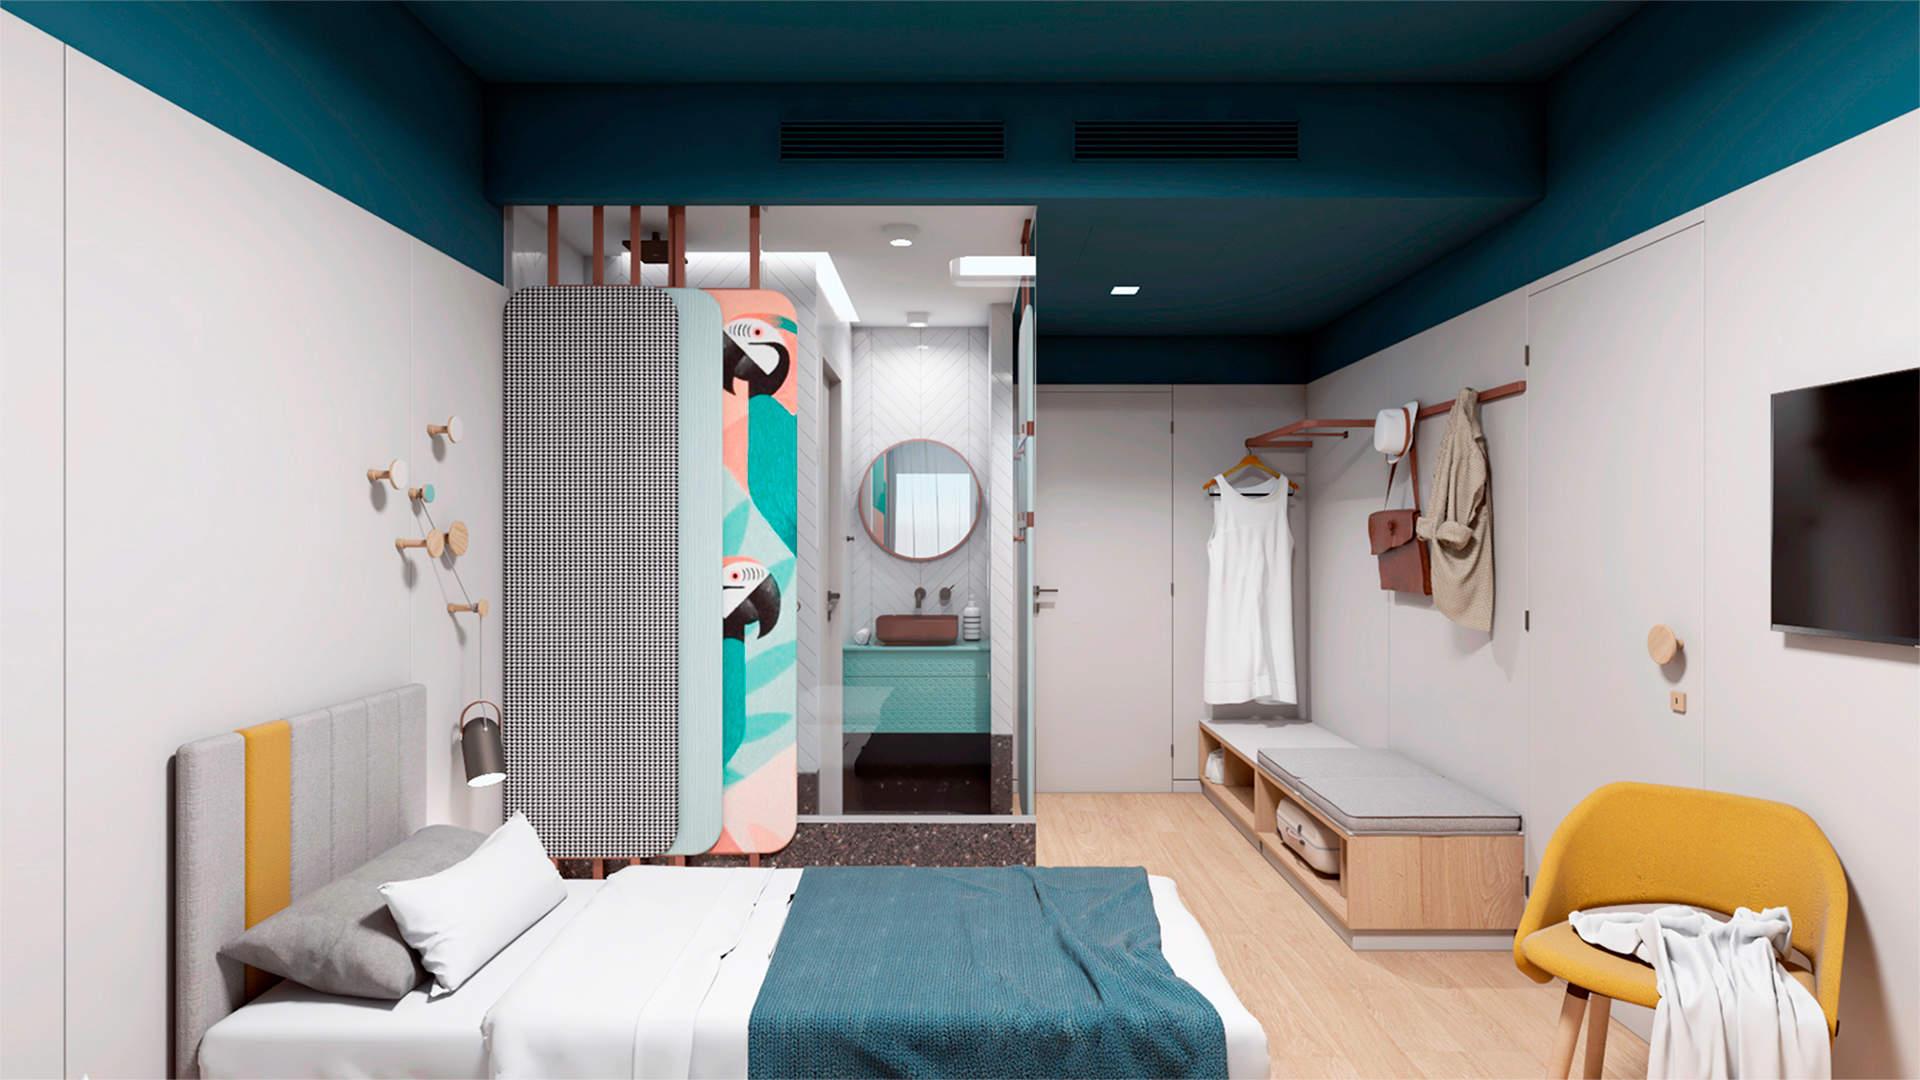 City hotel room, interior design, bed, open wardrobe and bathroom. Δωμάτιο αστικού ξενοδοχείου, κρεβάτια, ανοιχτό ντουλάπι, μπάνιο.